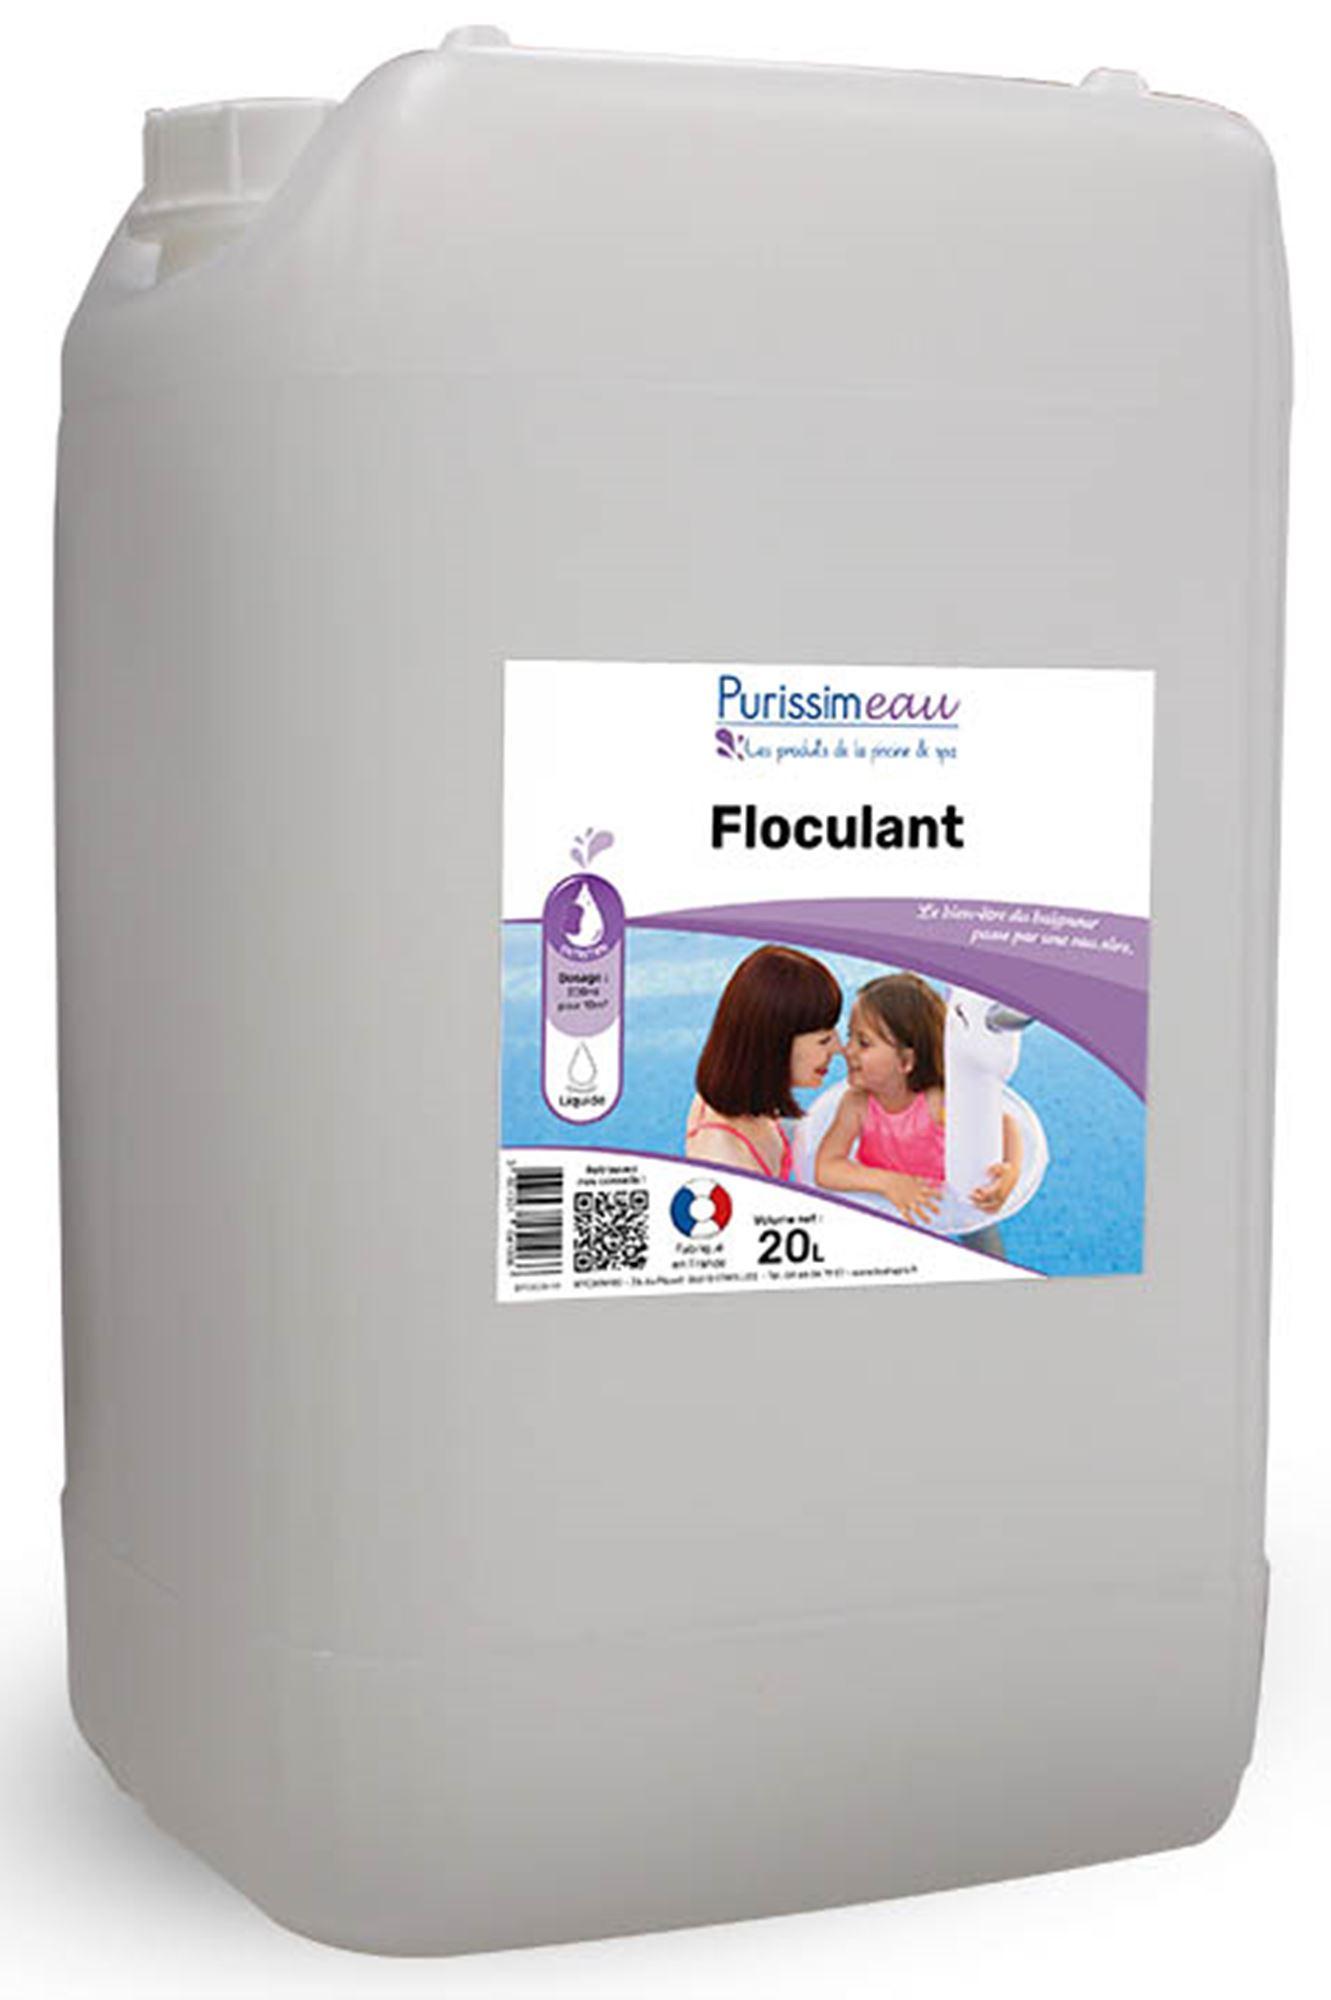 Floculant clarifiant pro liquide produit piscine bidon 20 l for Clarifiant piscine